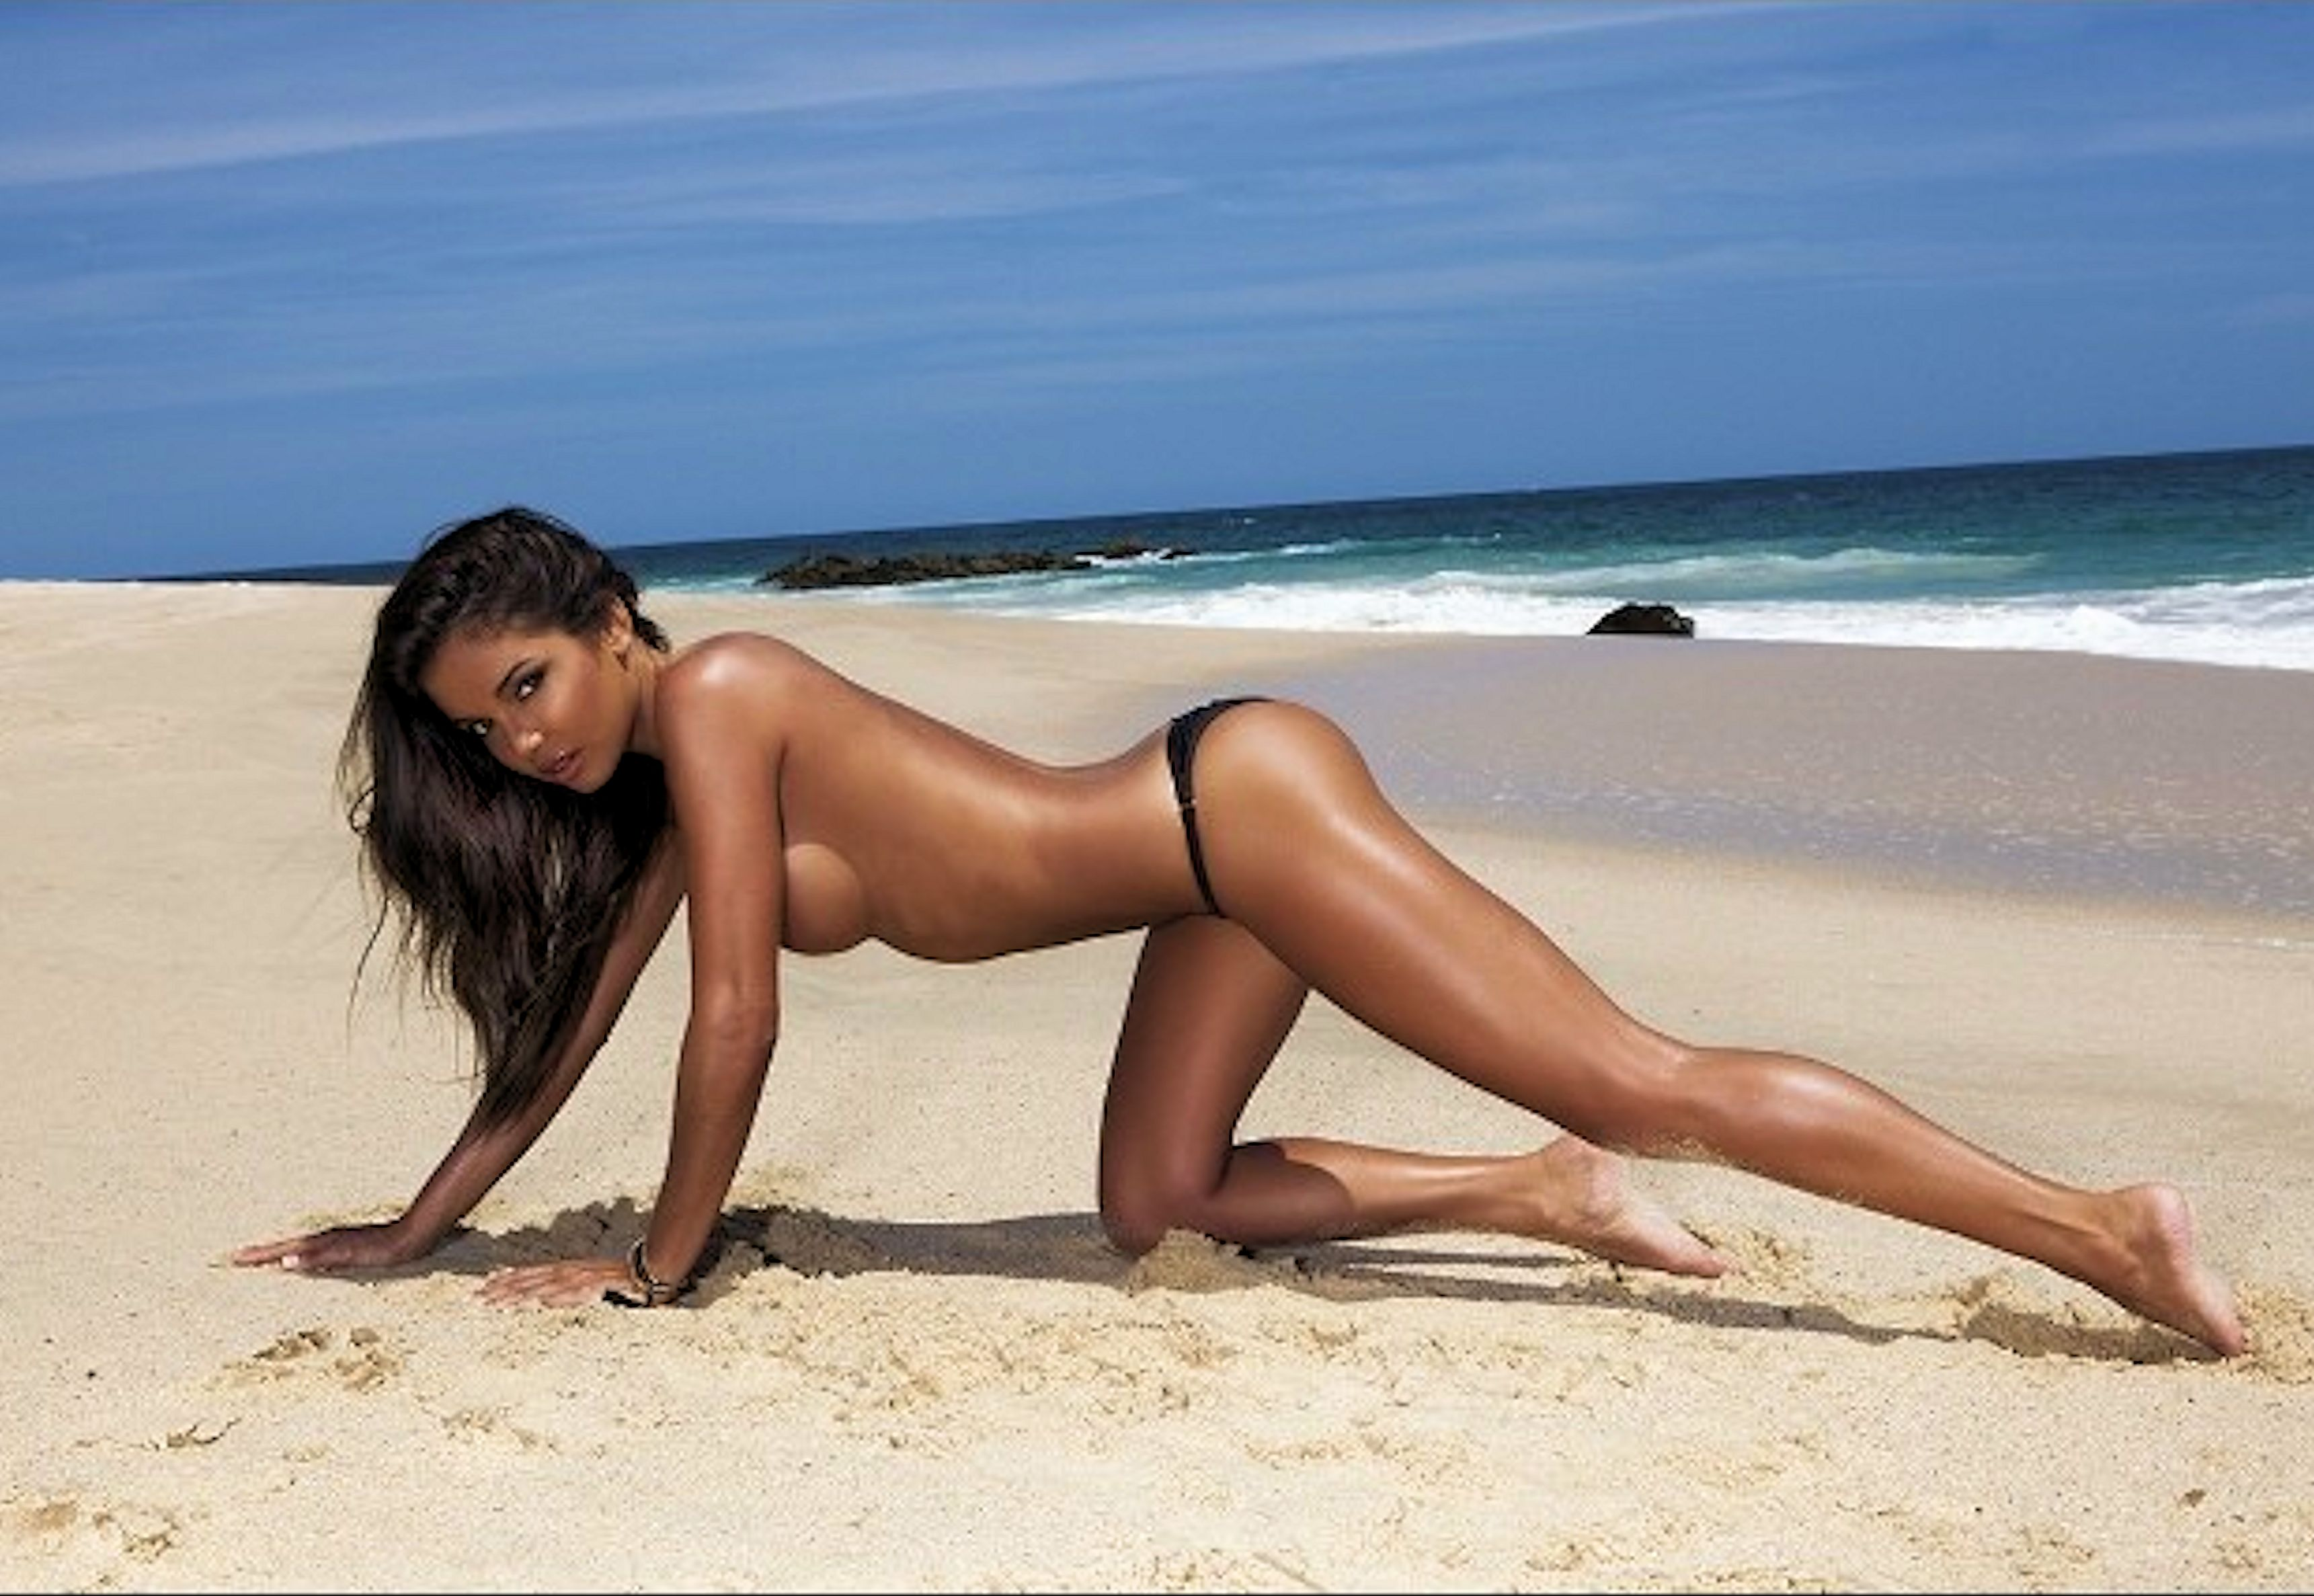 Tiny naked Asian girl